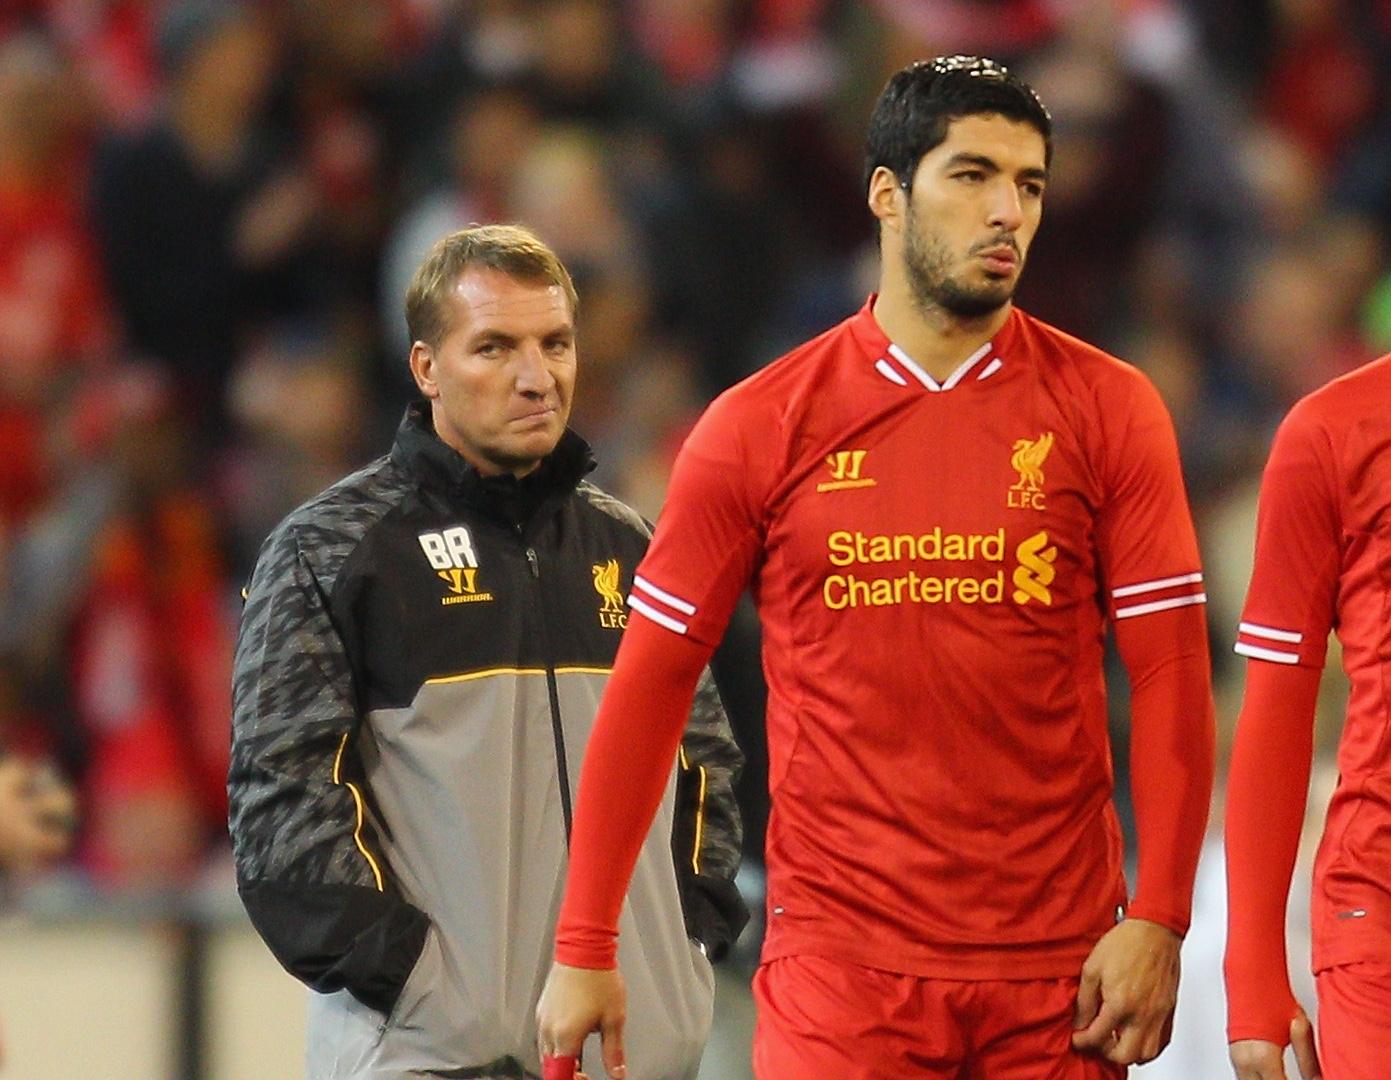 Brendan Rodgers Luis Suarez Liverpool 2013